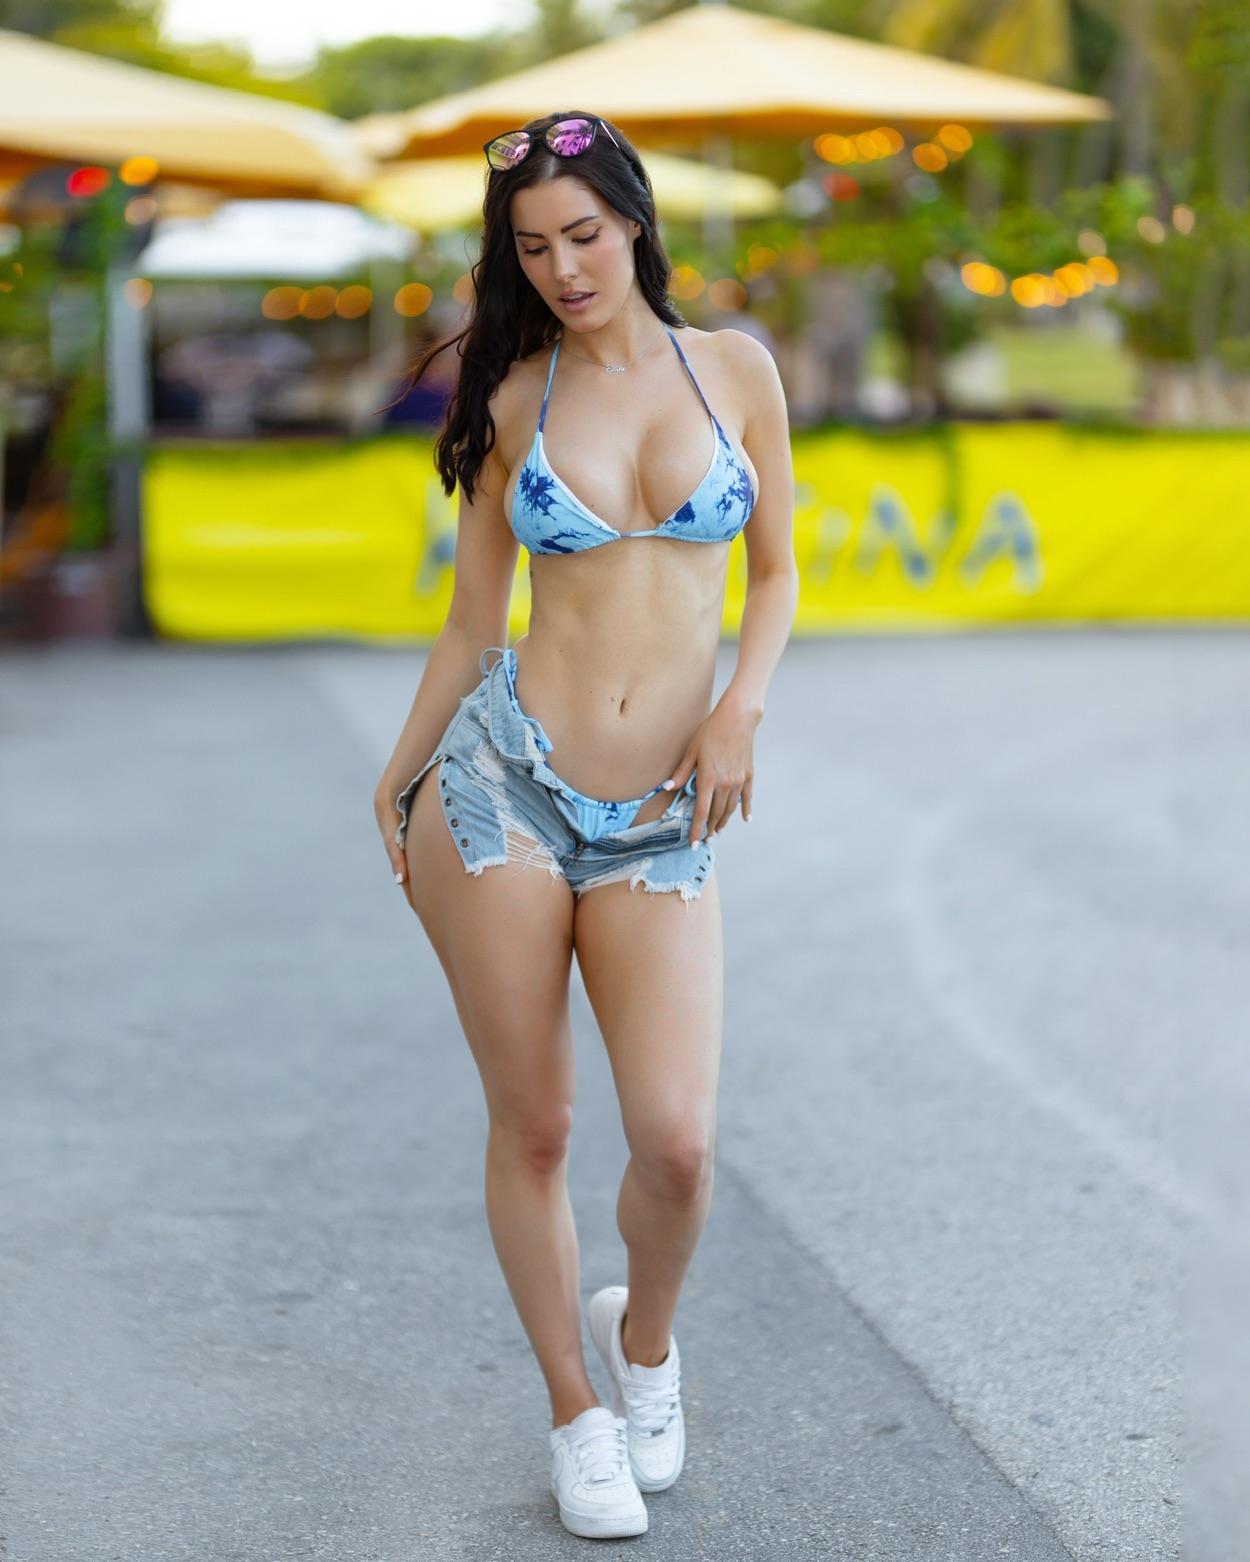 Erin Olash Bikini Denim Jeans Set Leaked 0013